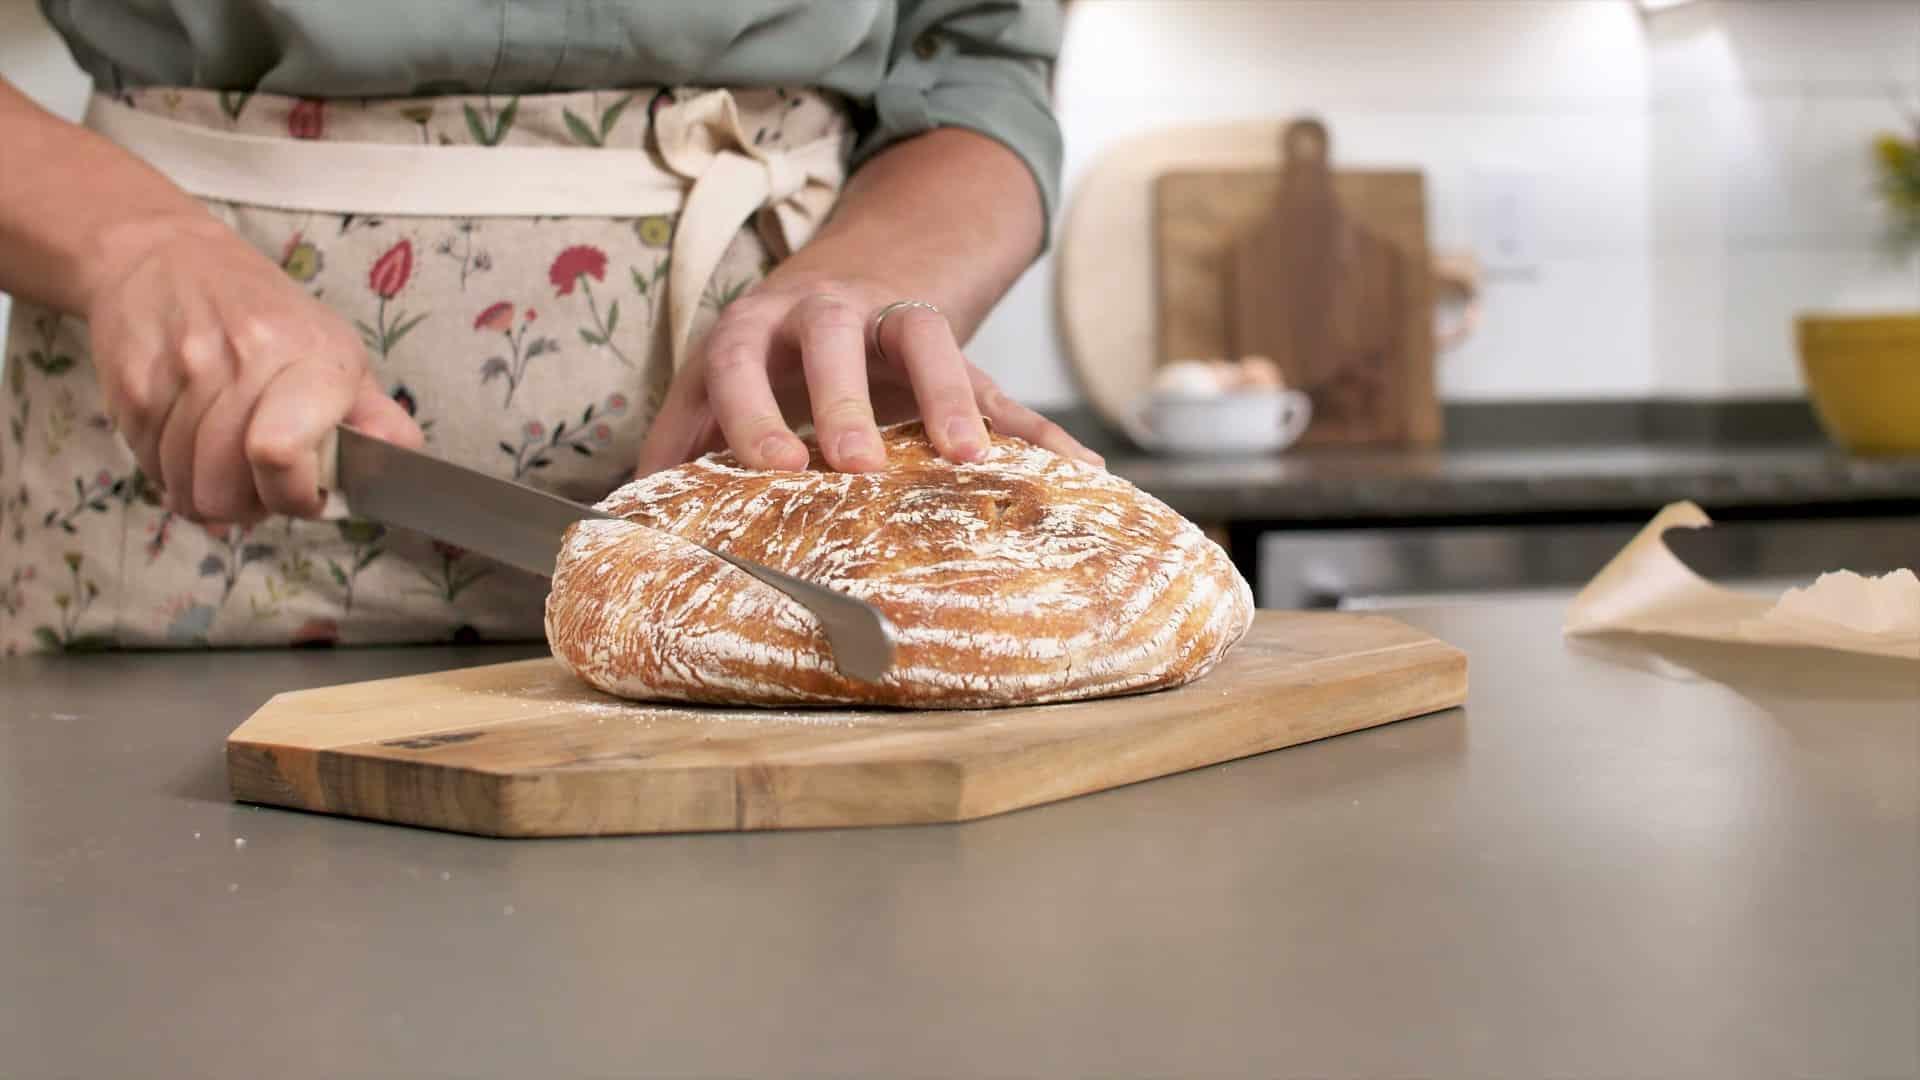 Using my sourdough starter to make sourdough bread